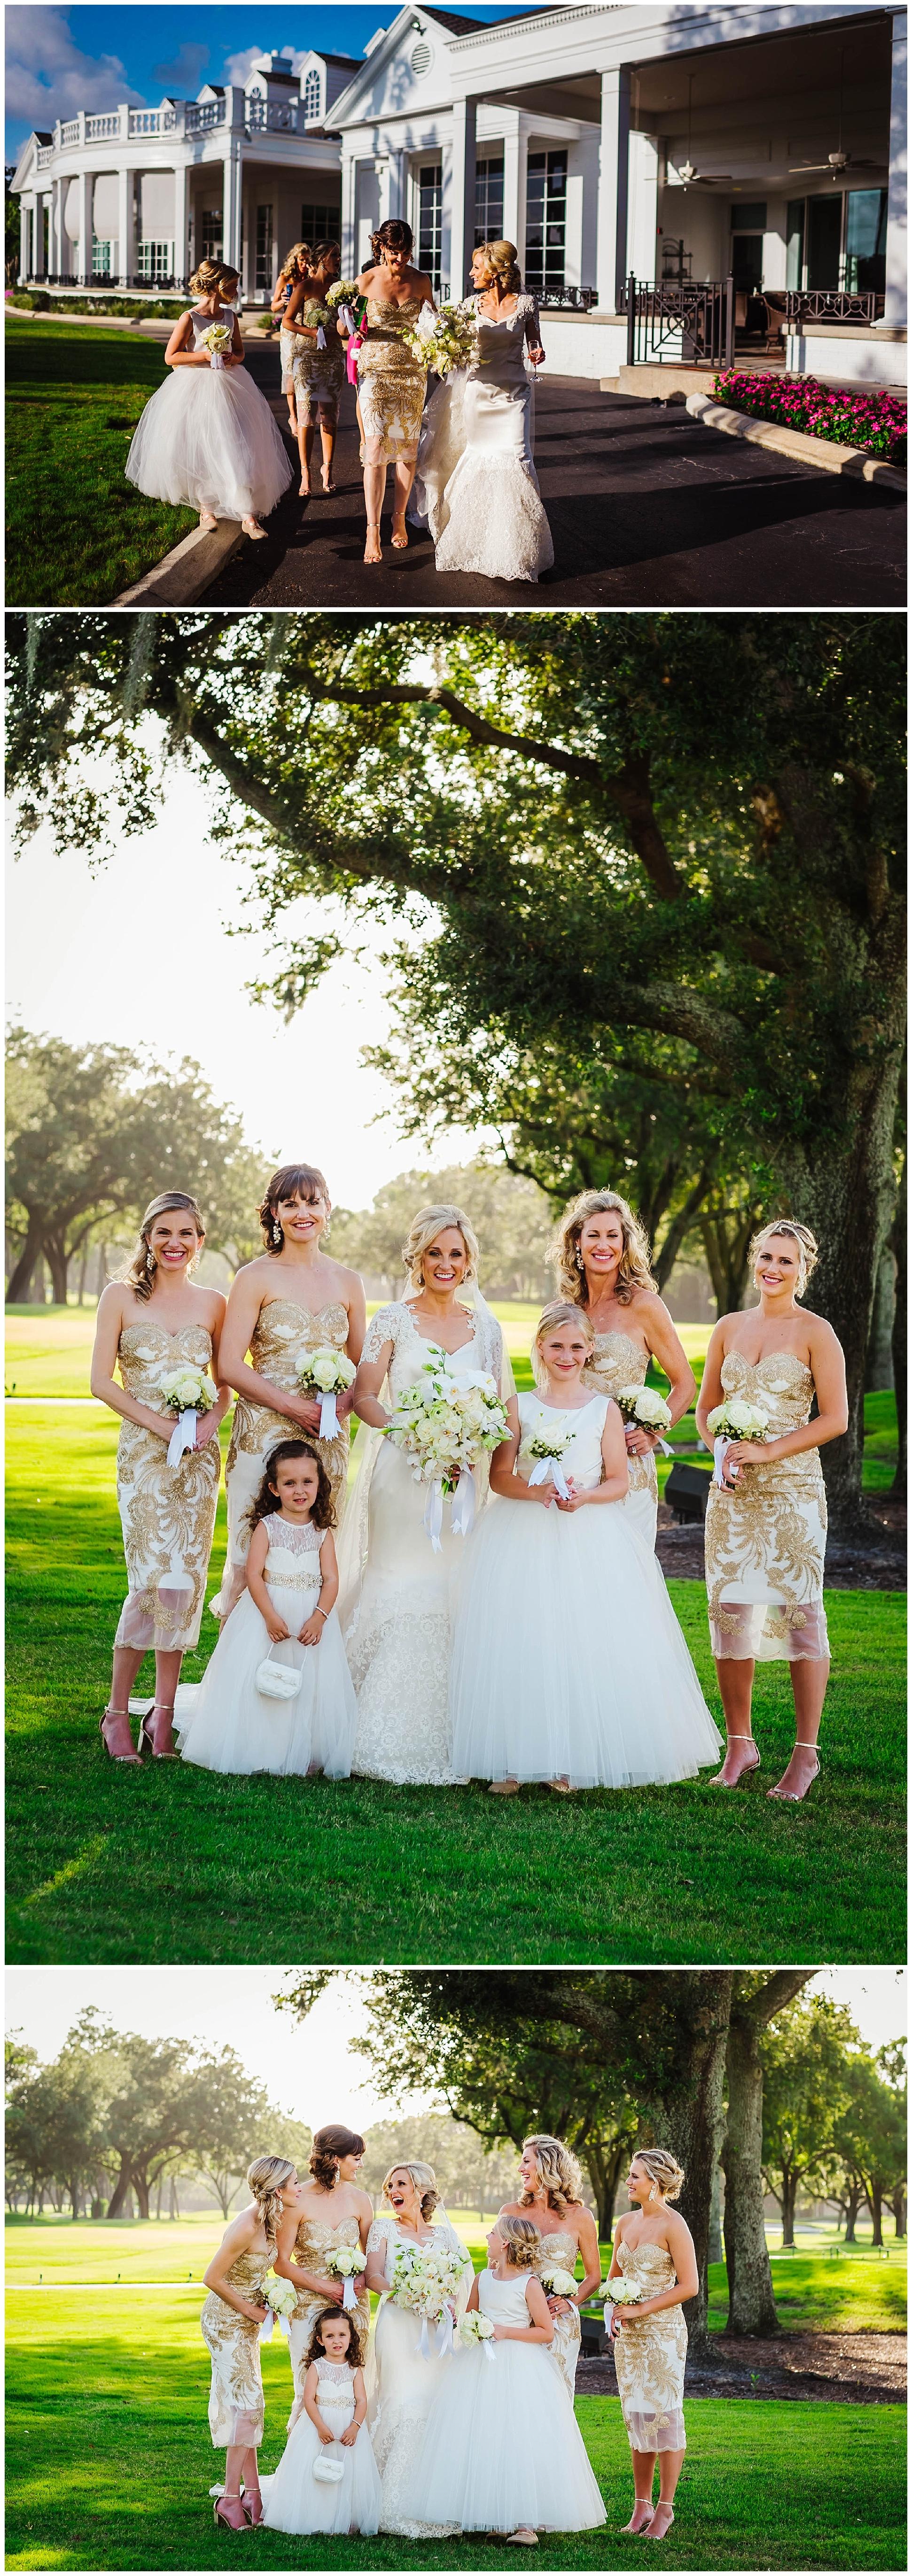 tampa-wedding-photographer-sleeves-palma-ceia-country-club-golf-course-sunset-luxury_0067.jpg